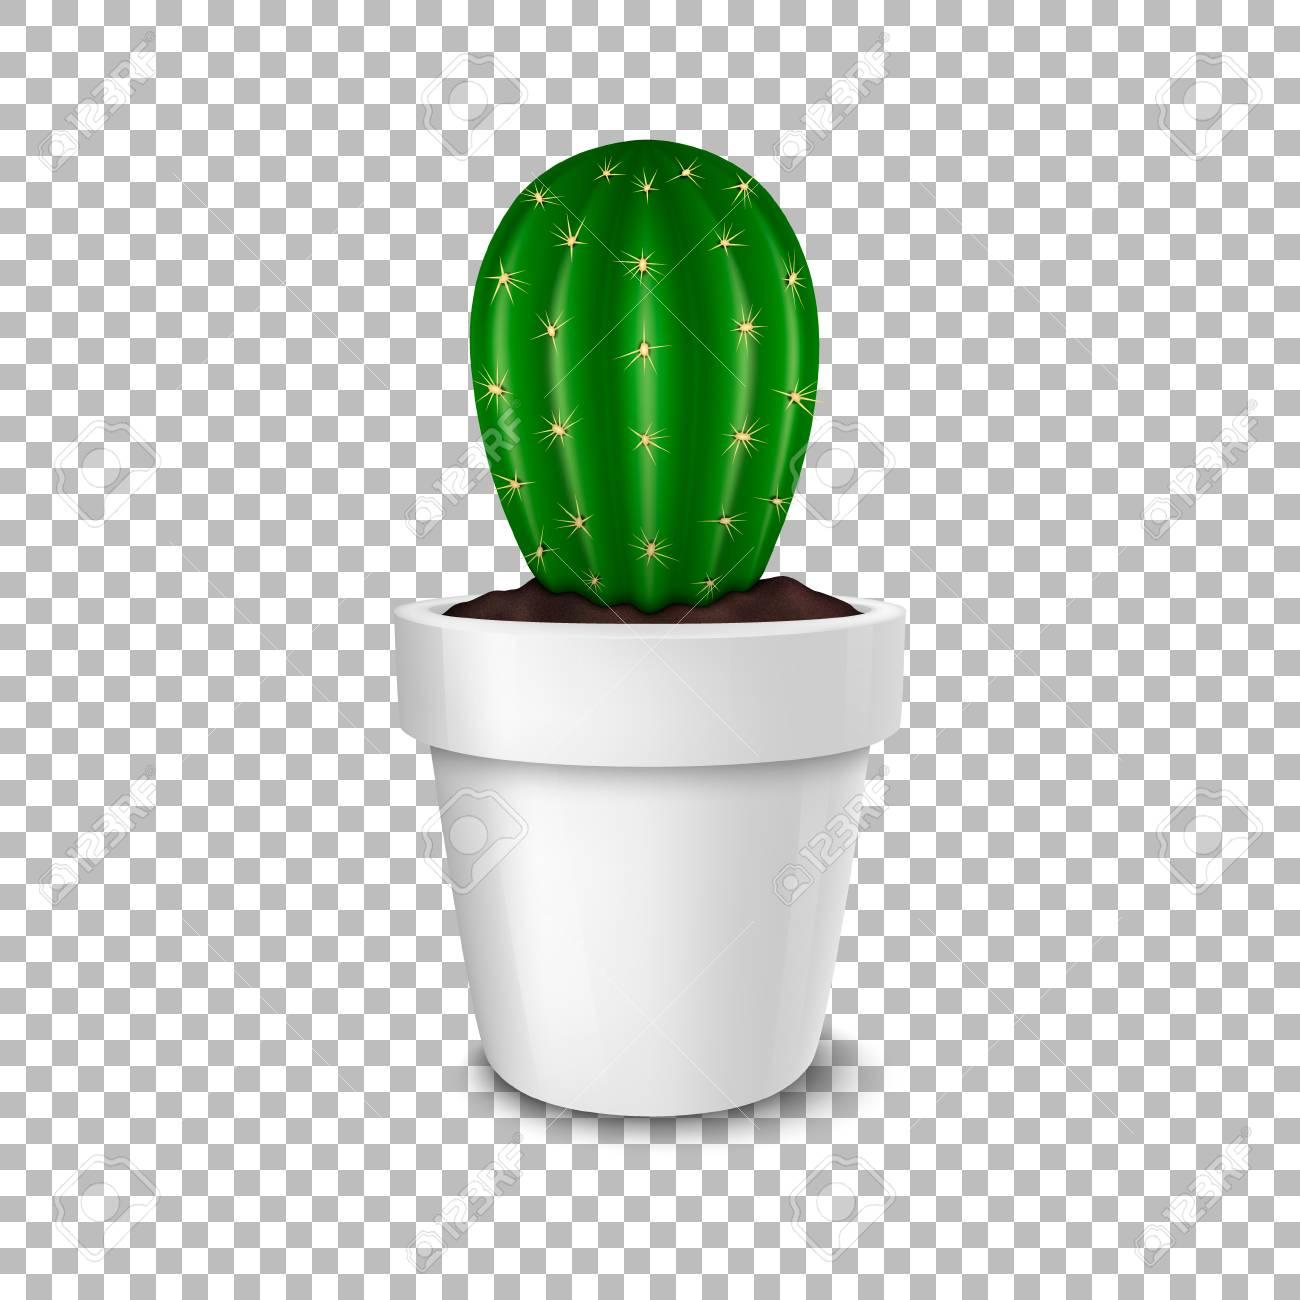 Realistic Decorative Cactus Plant In White Flower Pot Icon Closeup